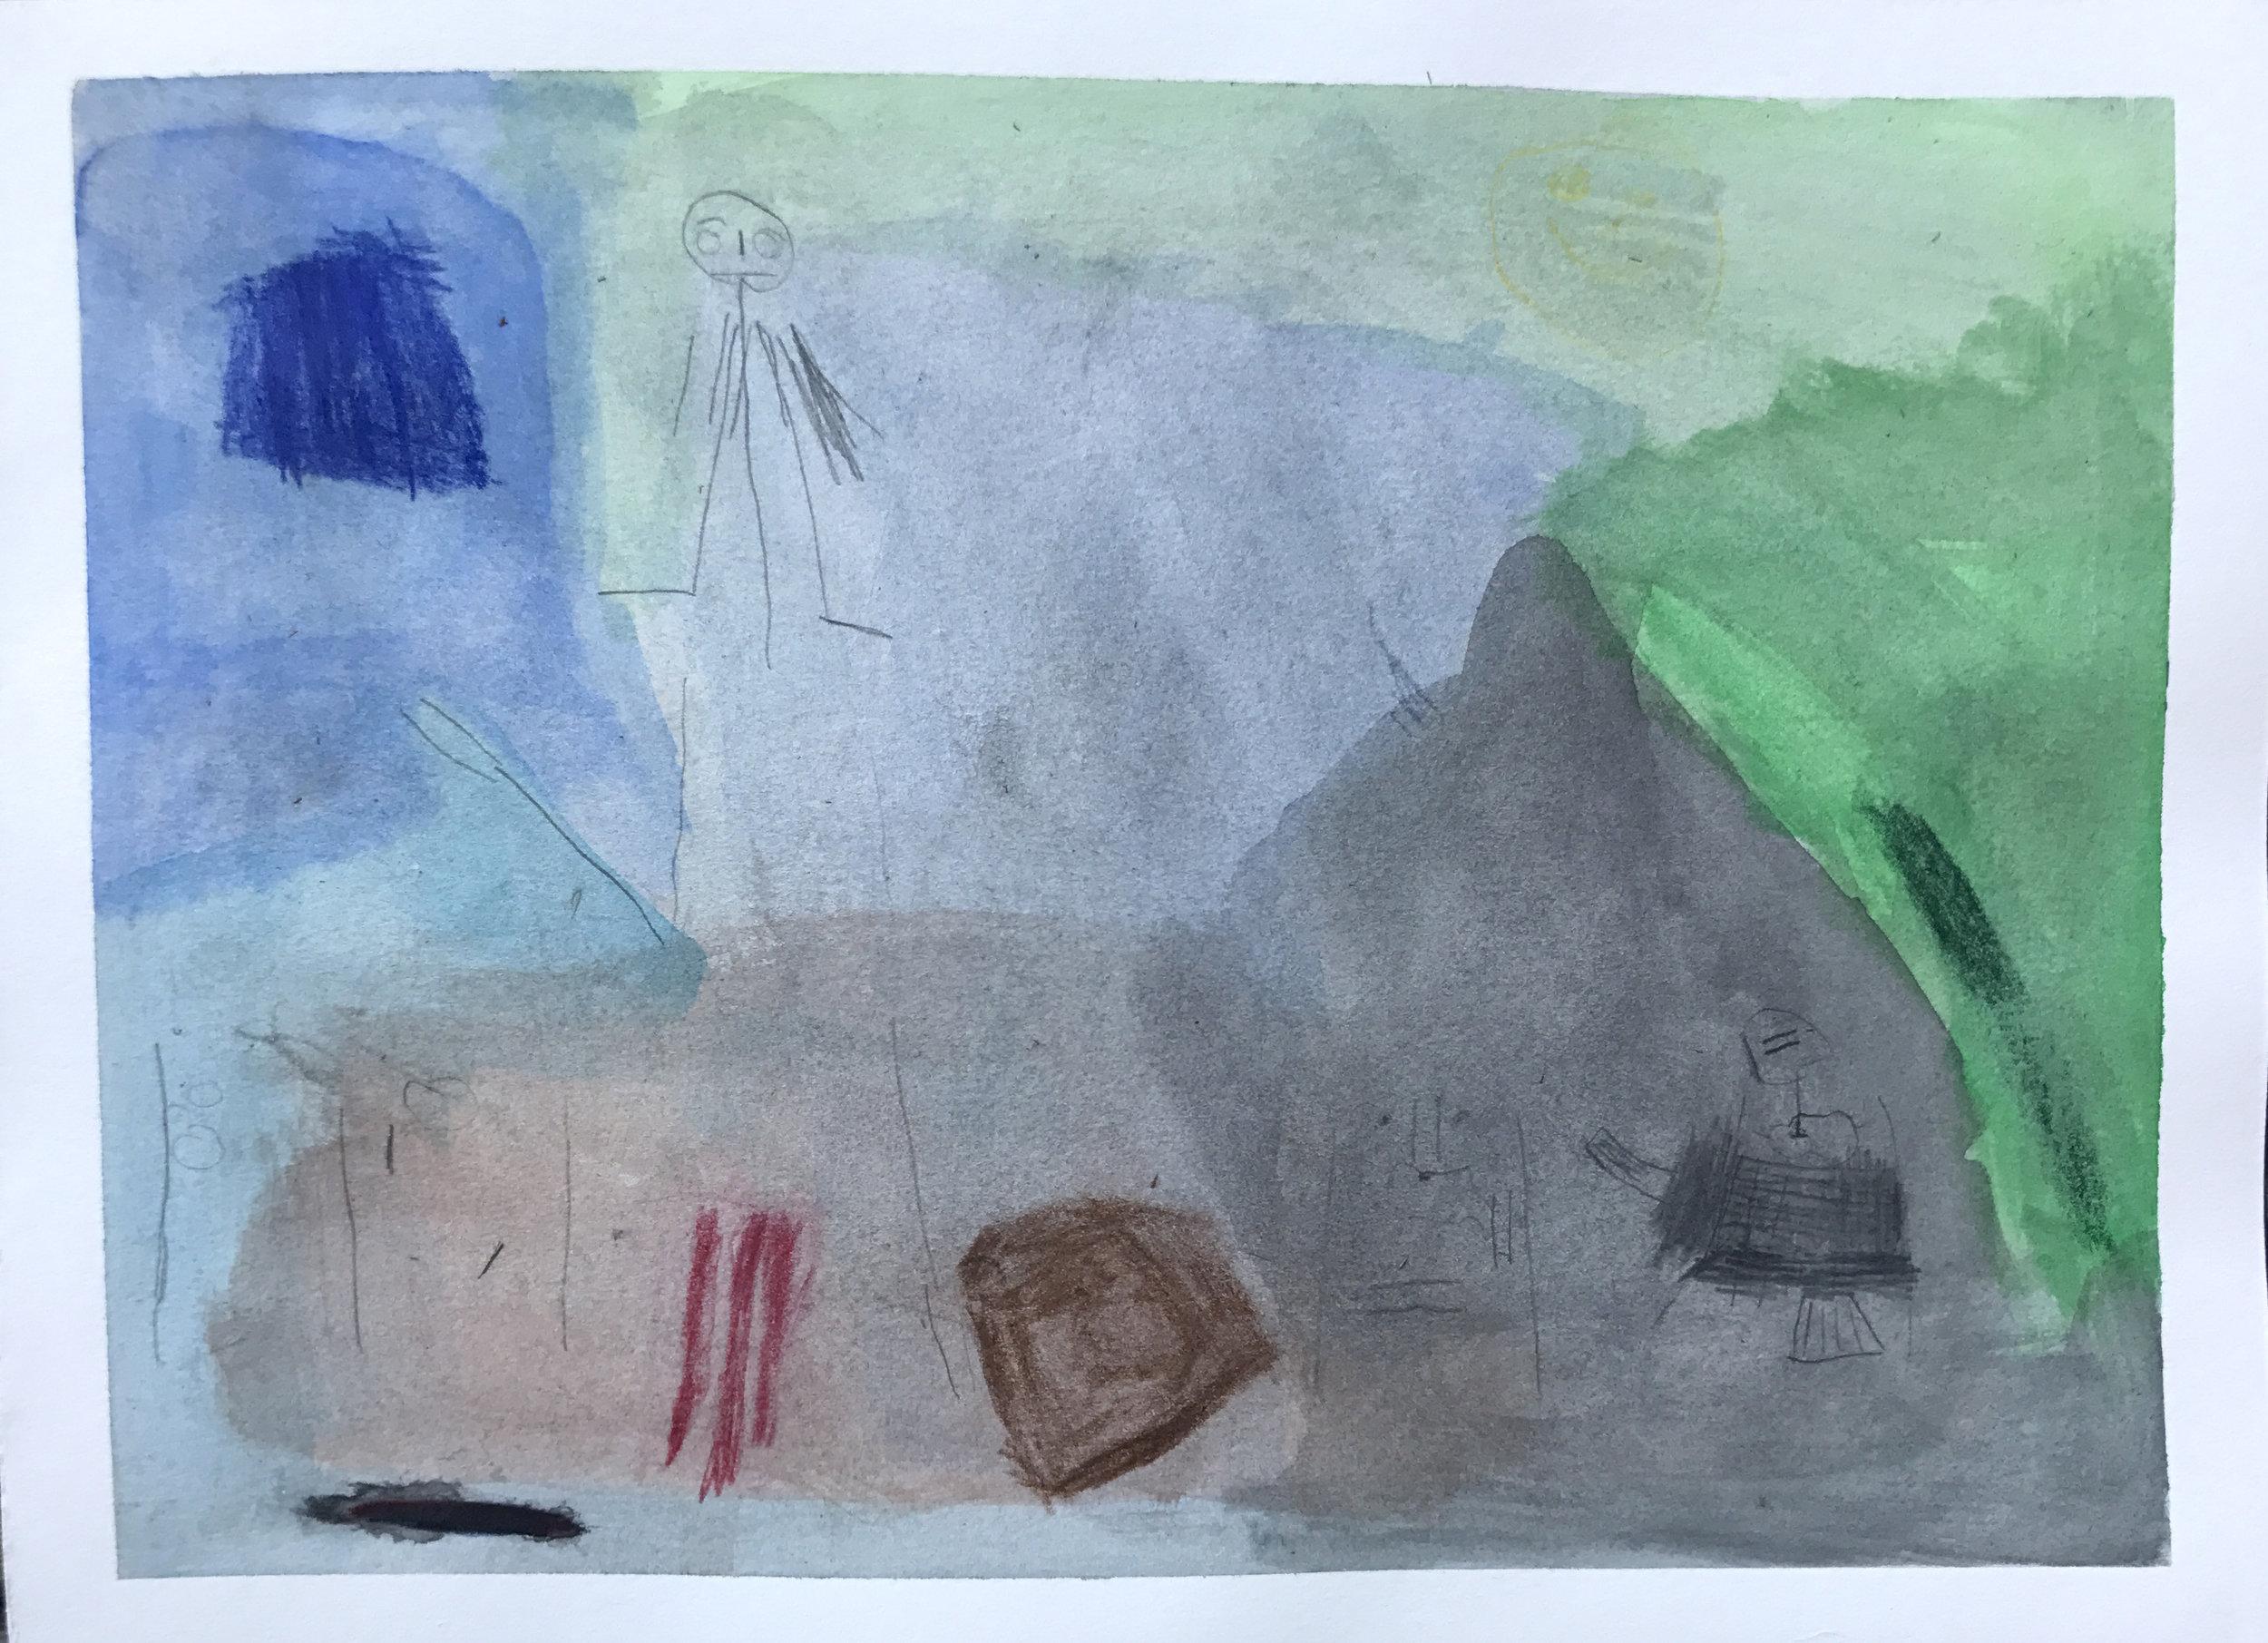 Untitled  - Watercolor - 2017 - Fiona Shea